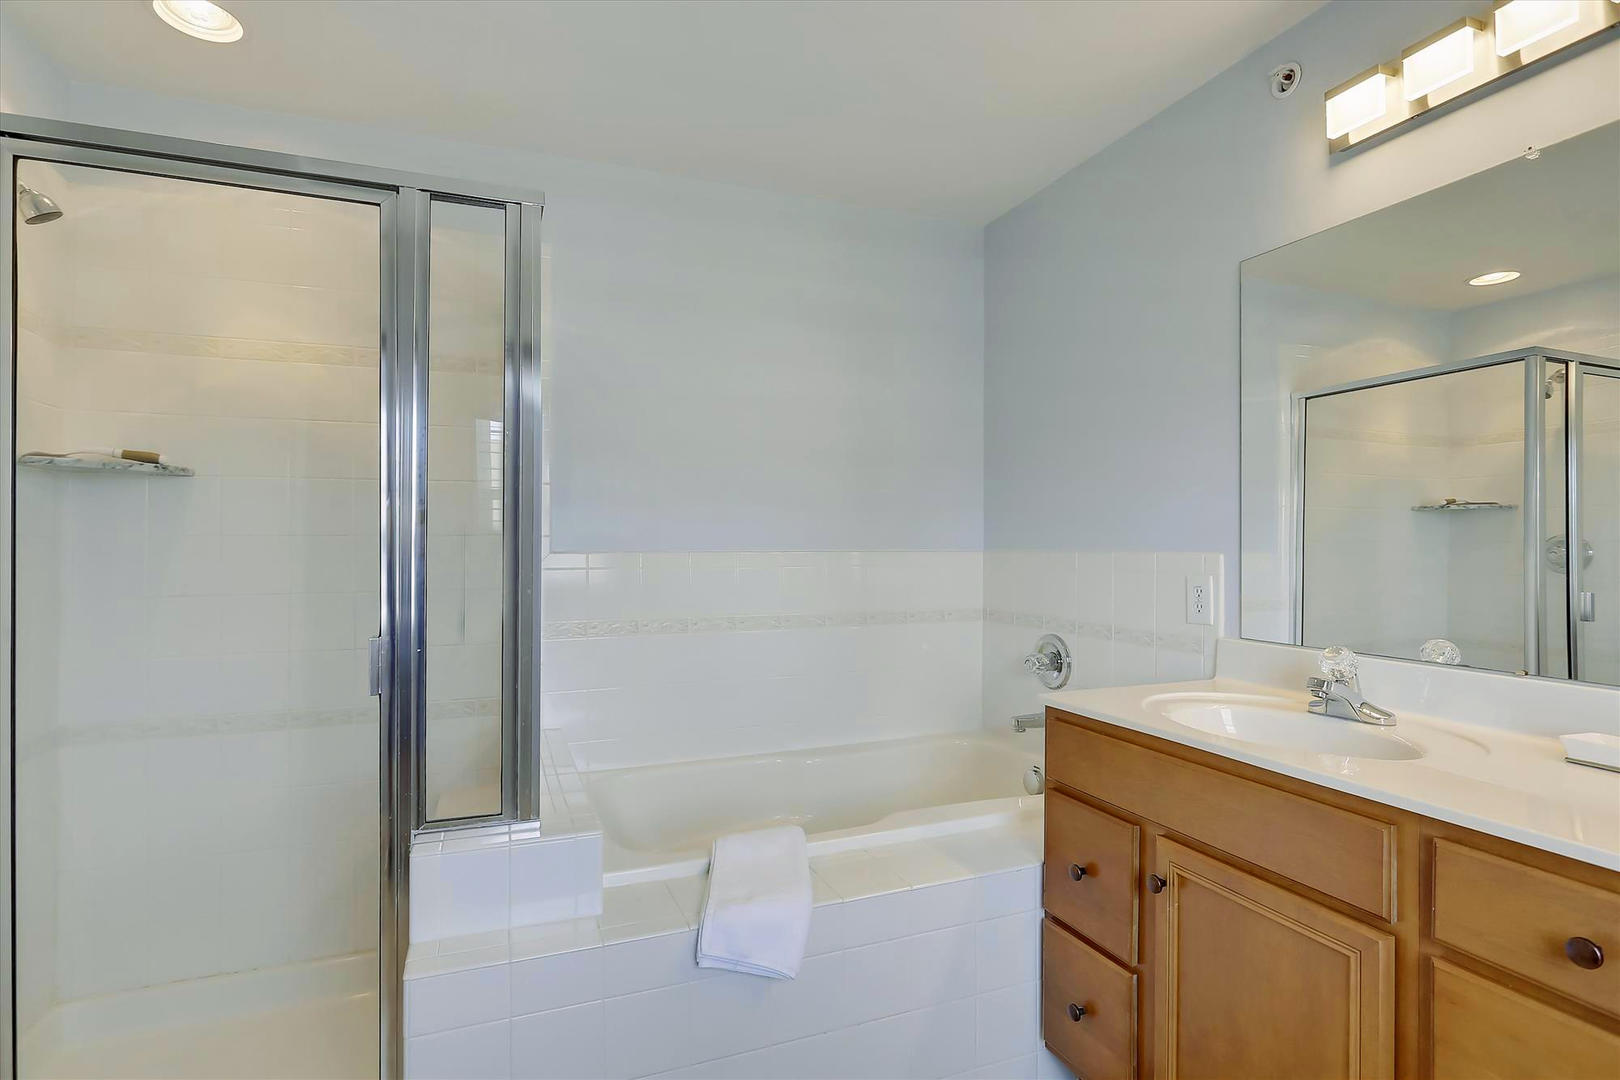 Bayside at Bethany Lakes - Bathroom 2